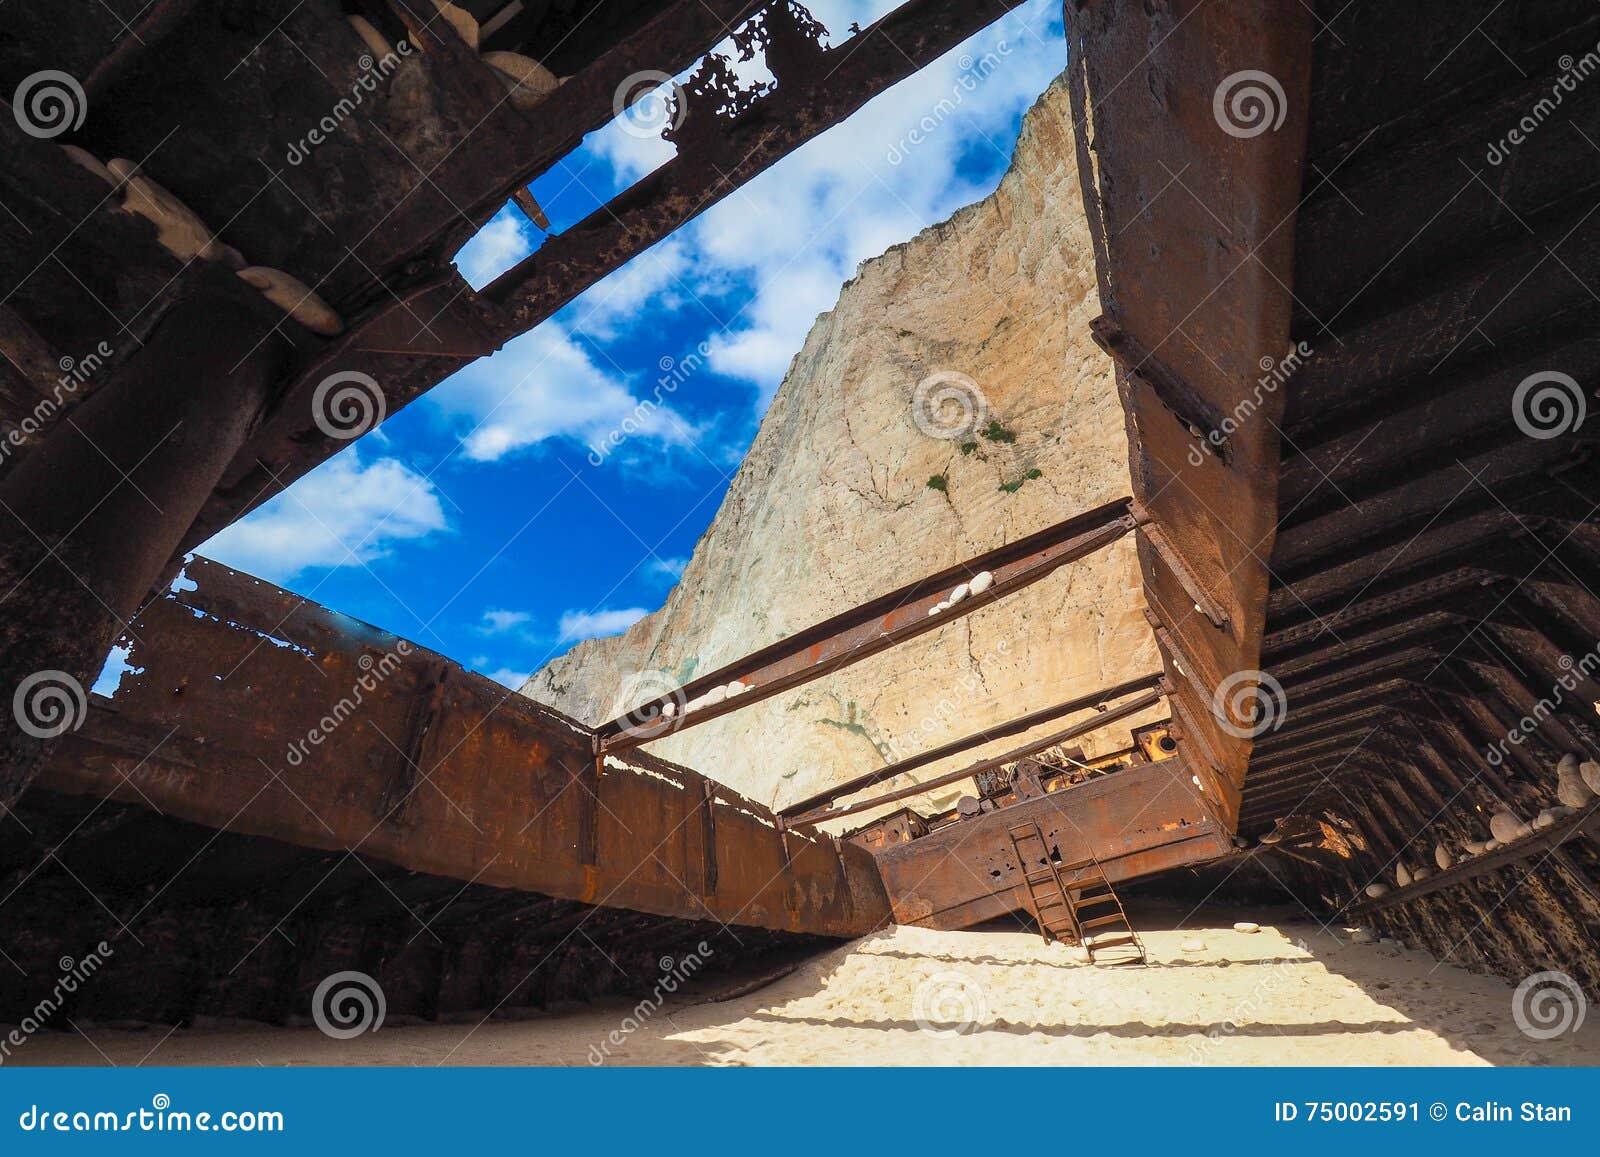 Panagiotis Shipwreck At Navagio Beach Zakynthos Greece Stock Photo - Image: 75002591